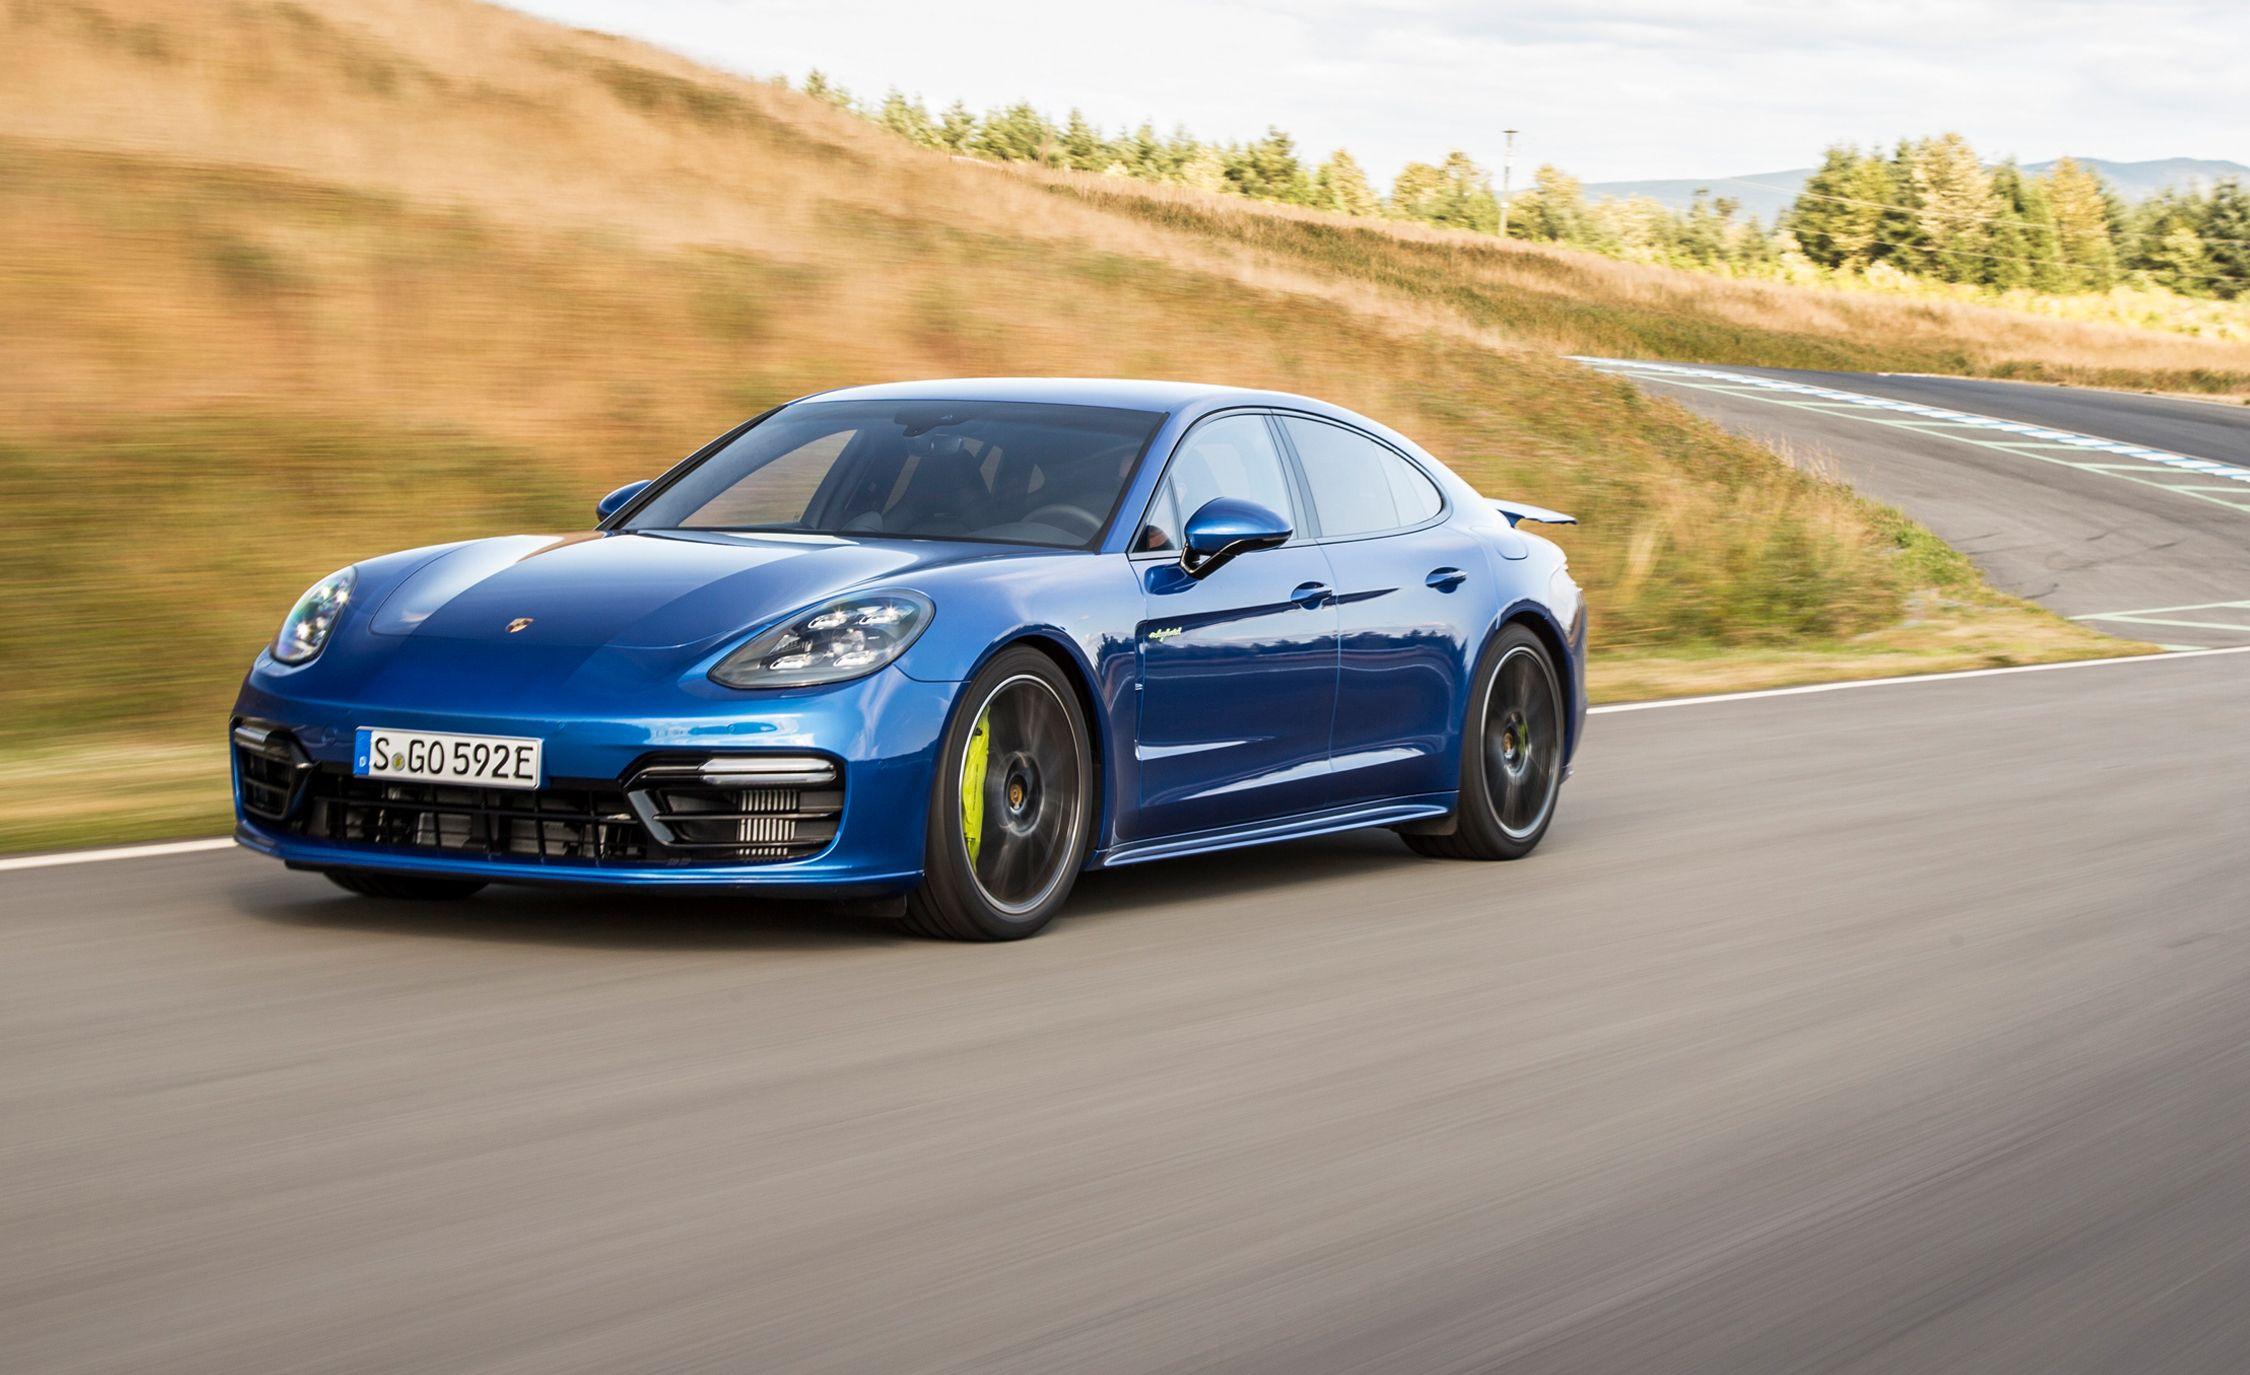 2018 Porsche Panamera Turbo S E,Hybrid First Drive